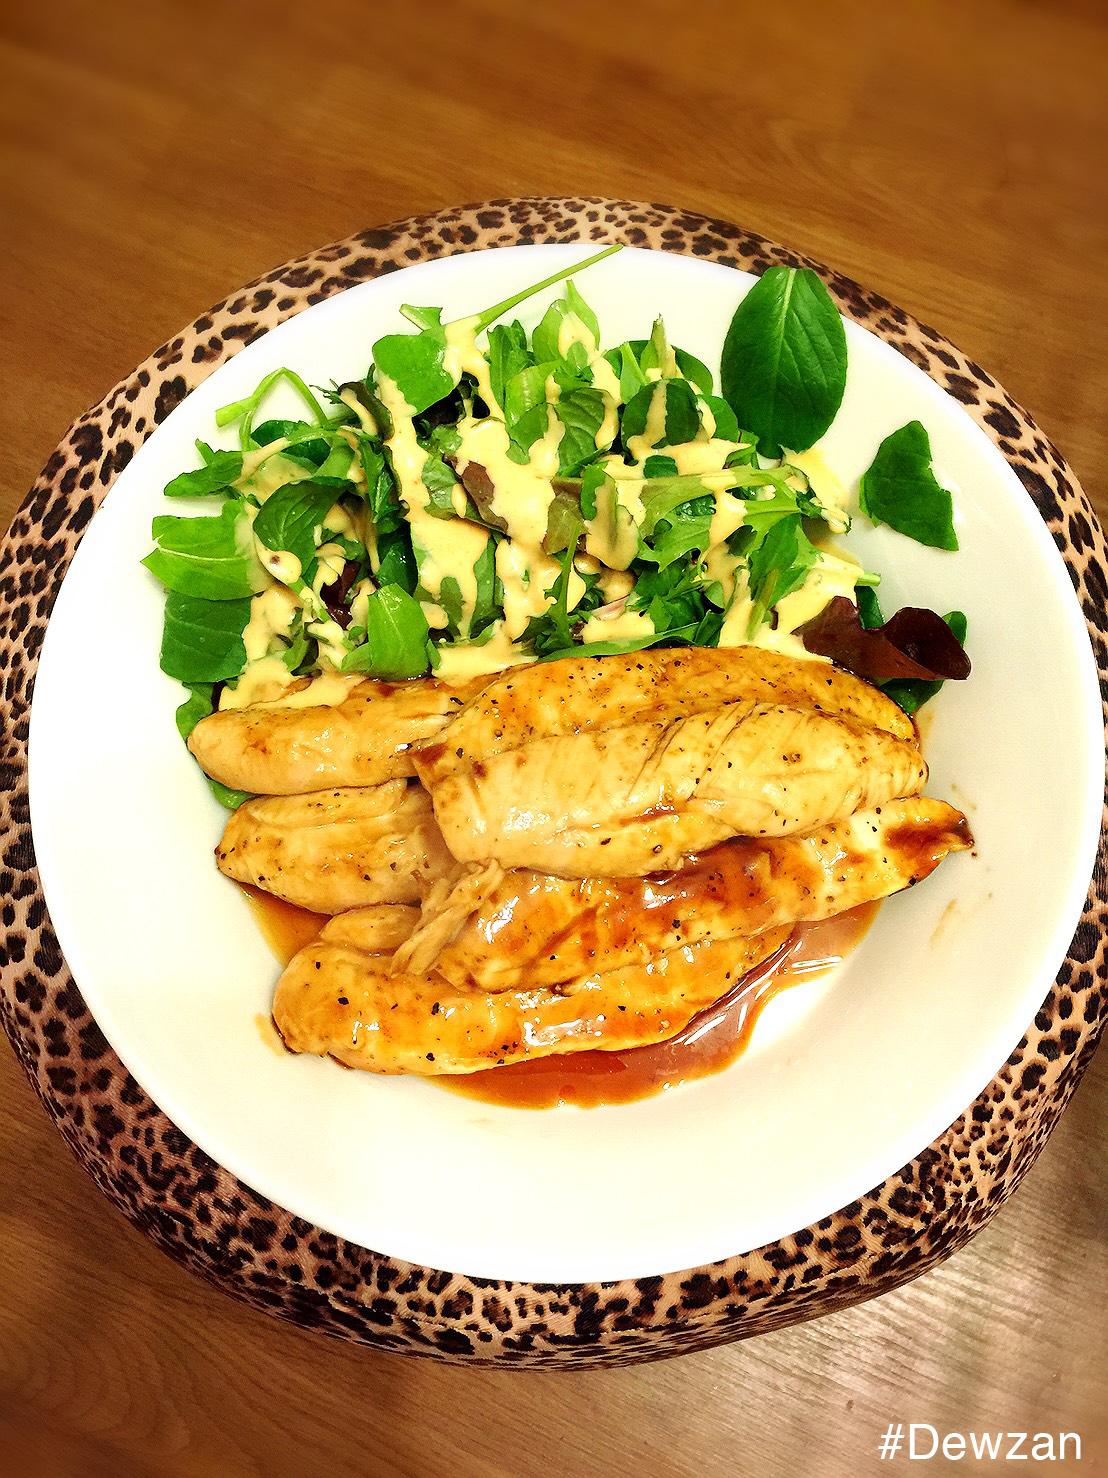 shuho,筋肉,筋トレ,食事,ささみ,ダイエット